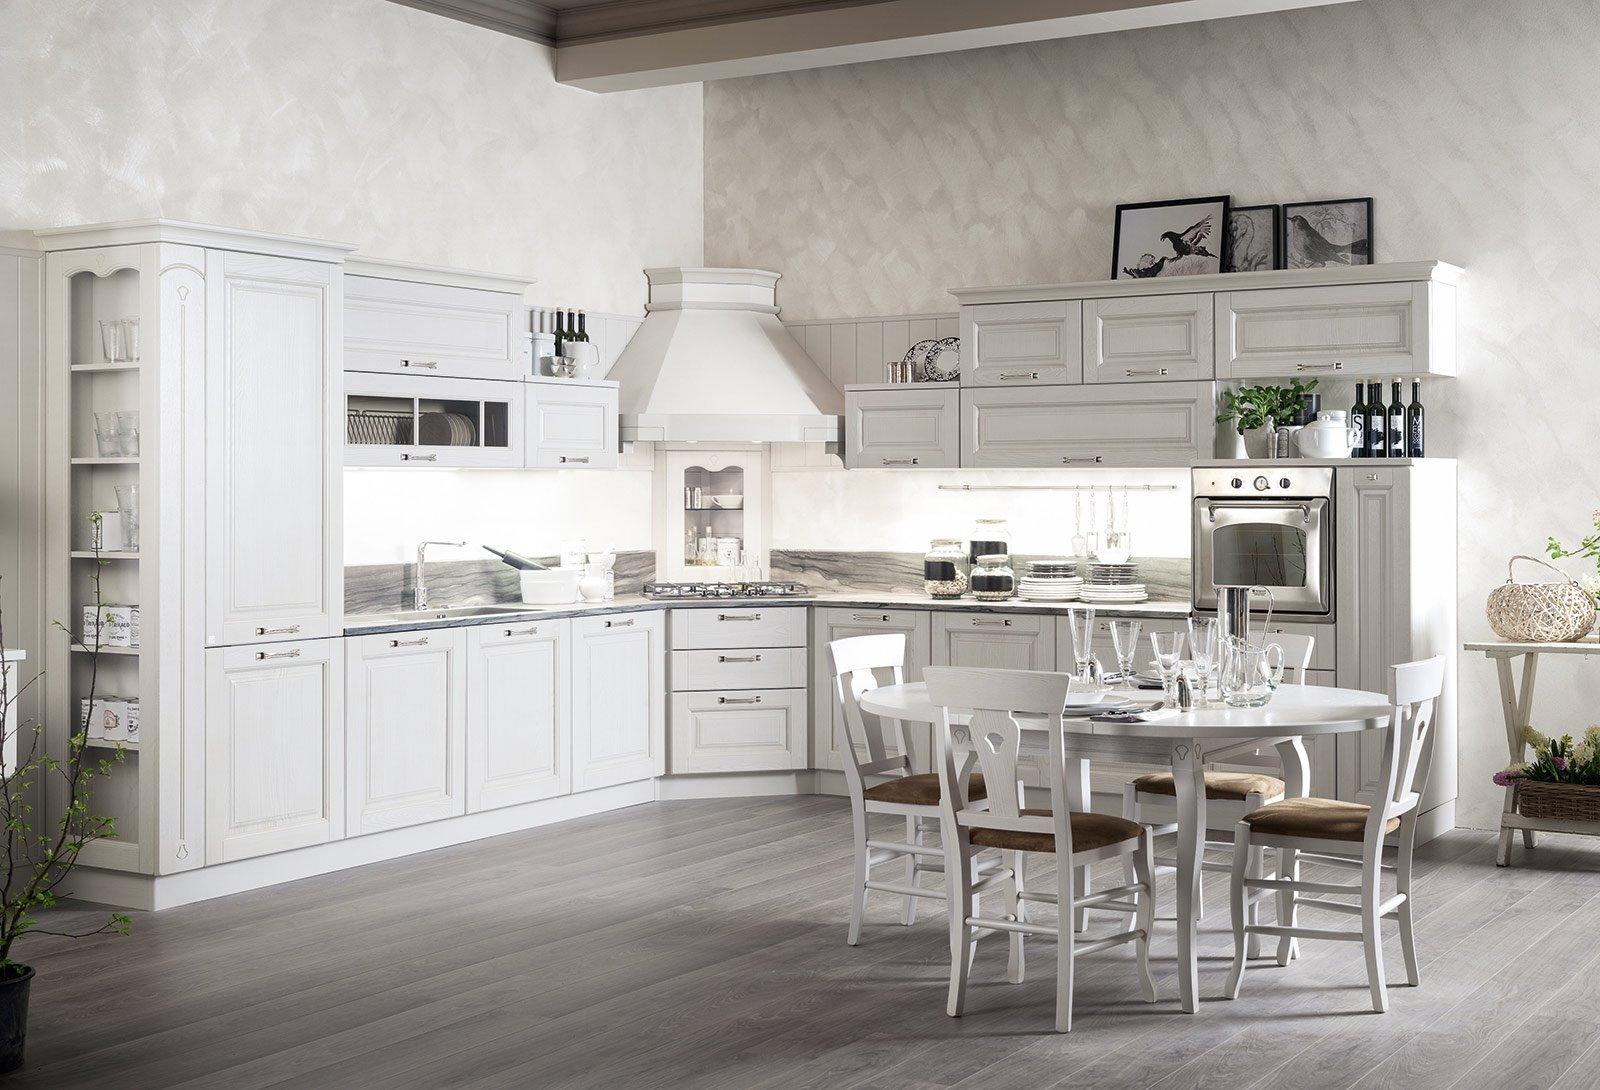 4 stosa bolgheri 12 cose di casa for Rivestimenti per cucine classiche